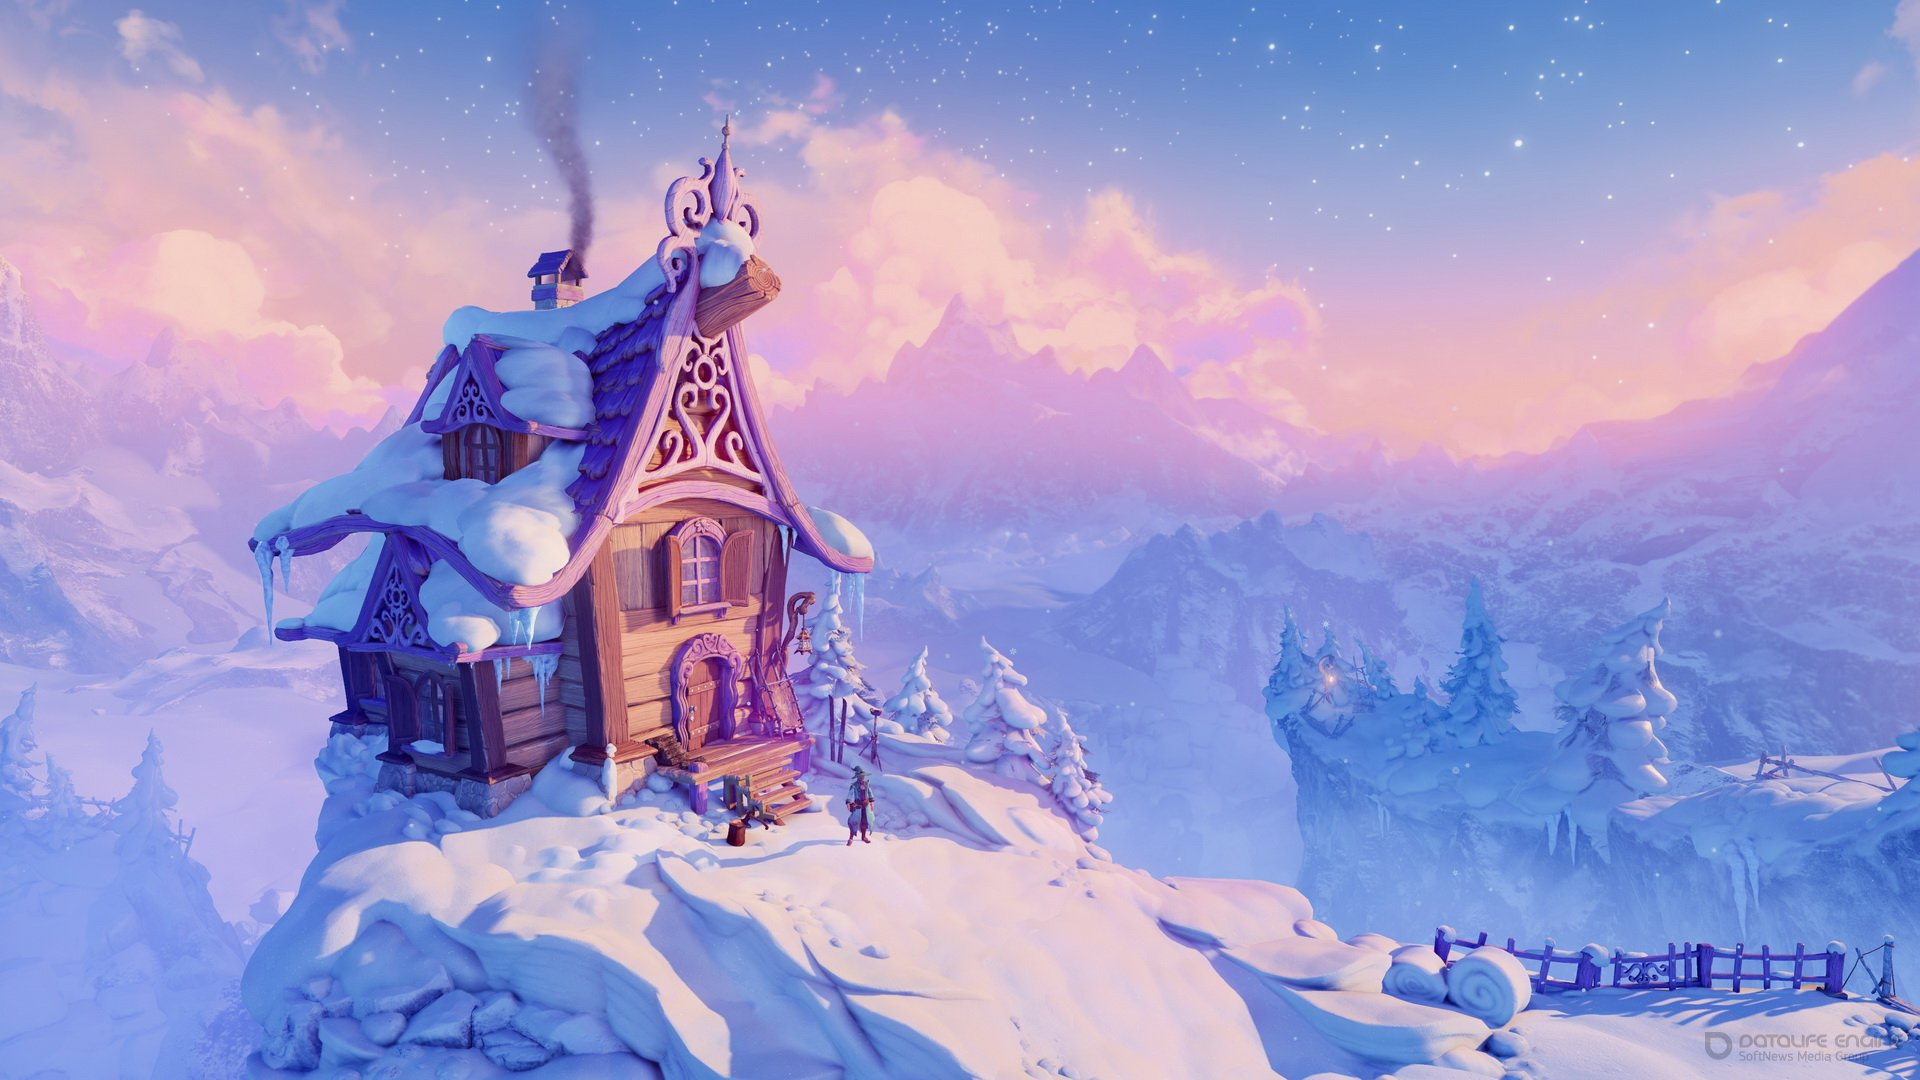 Скриншот к игре Trine 4: The Nightmare Prince [1.0.0.8236 (35264)] (2019) скачать торрент RePack от xatab